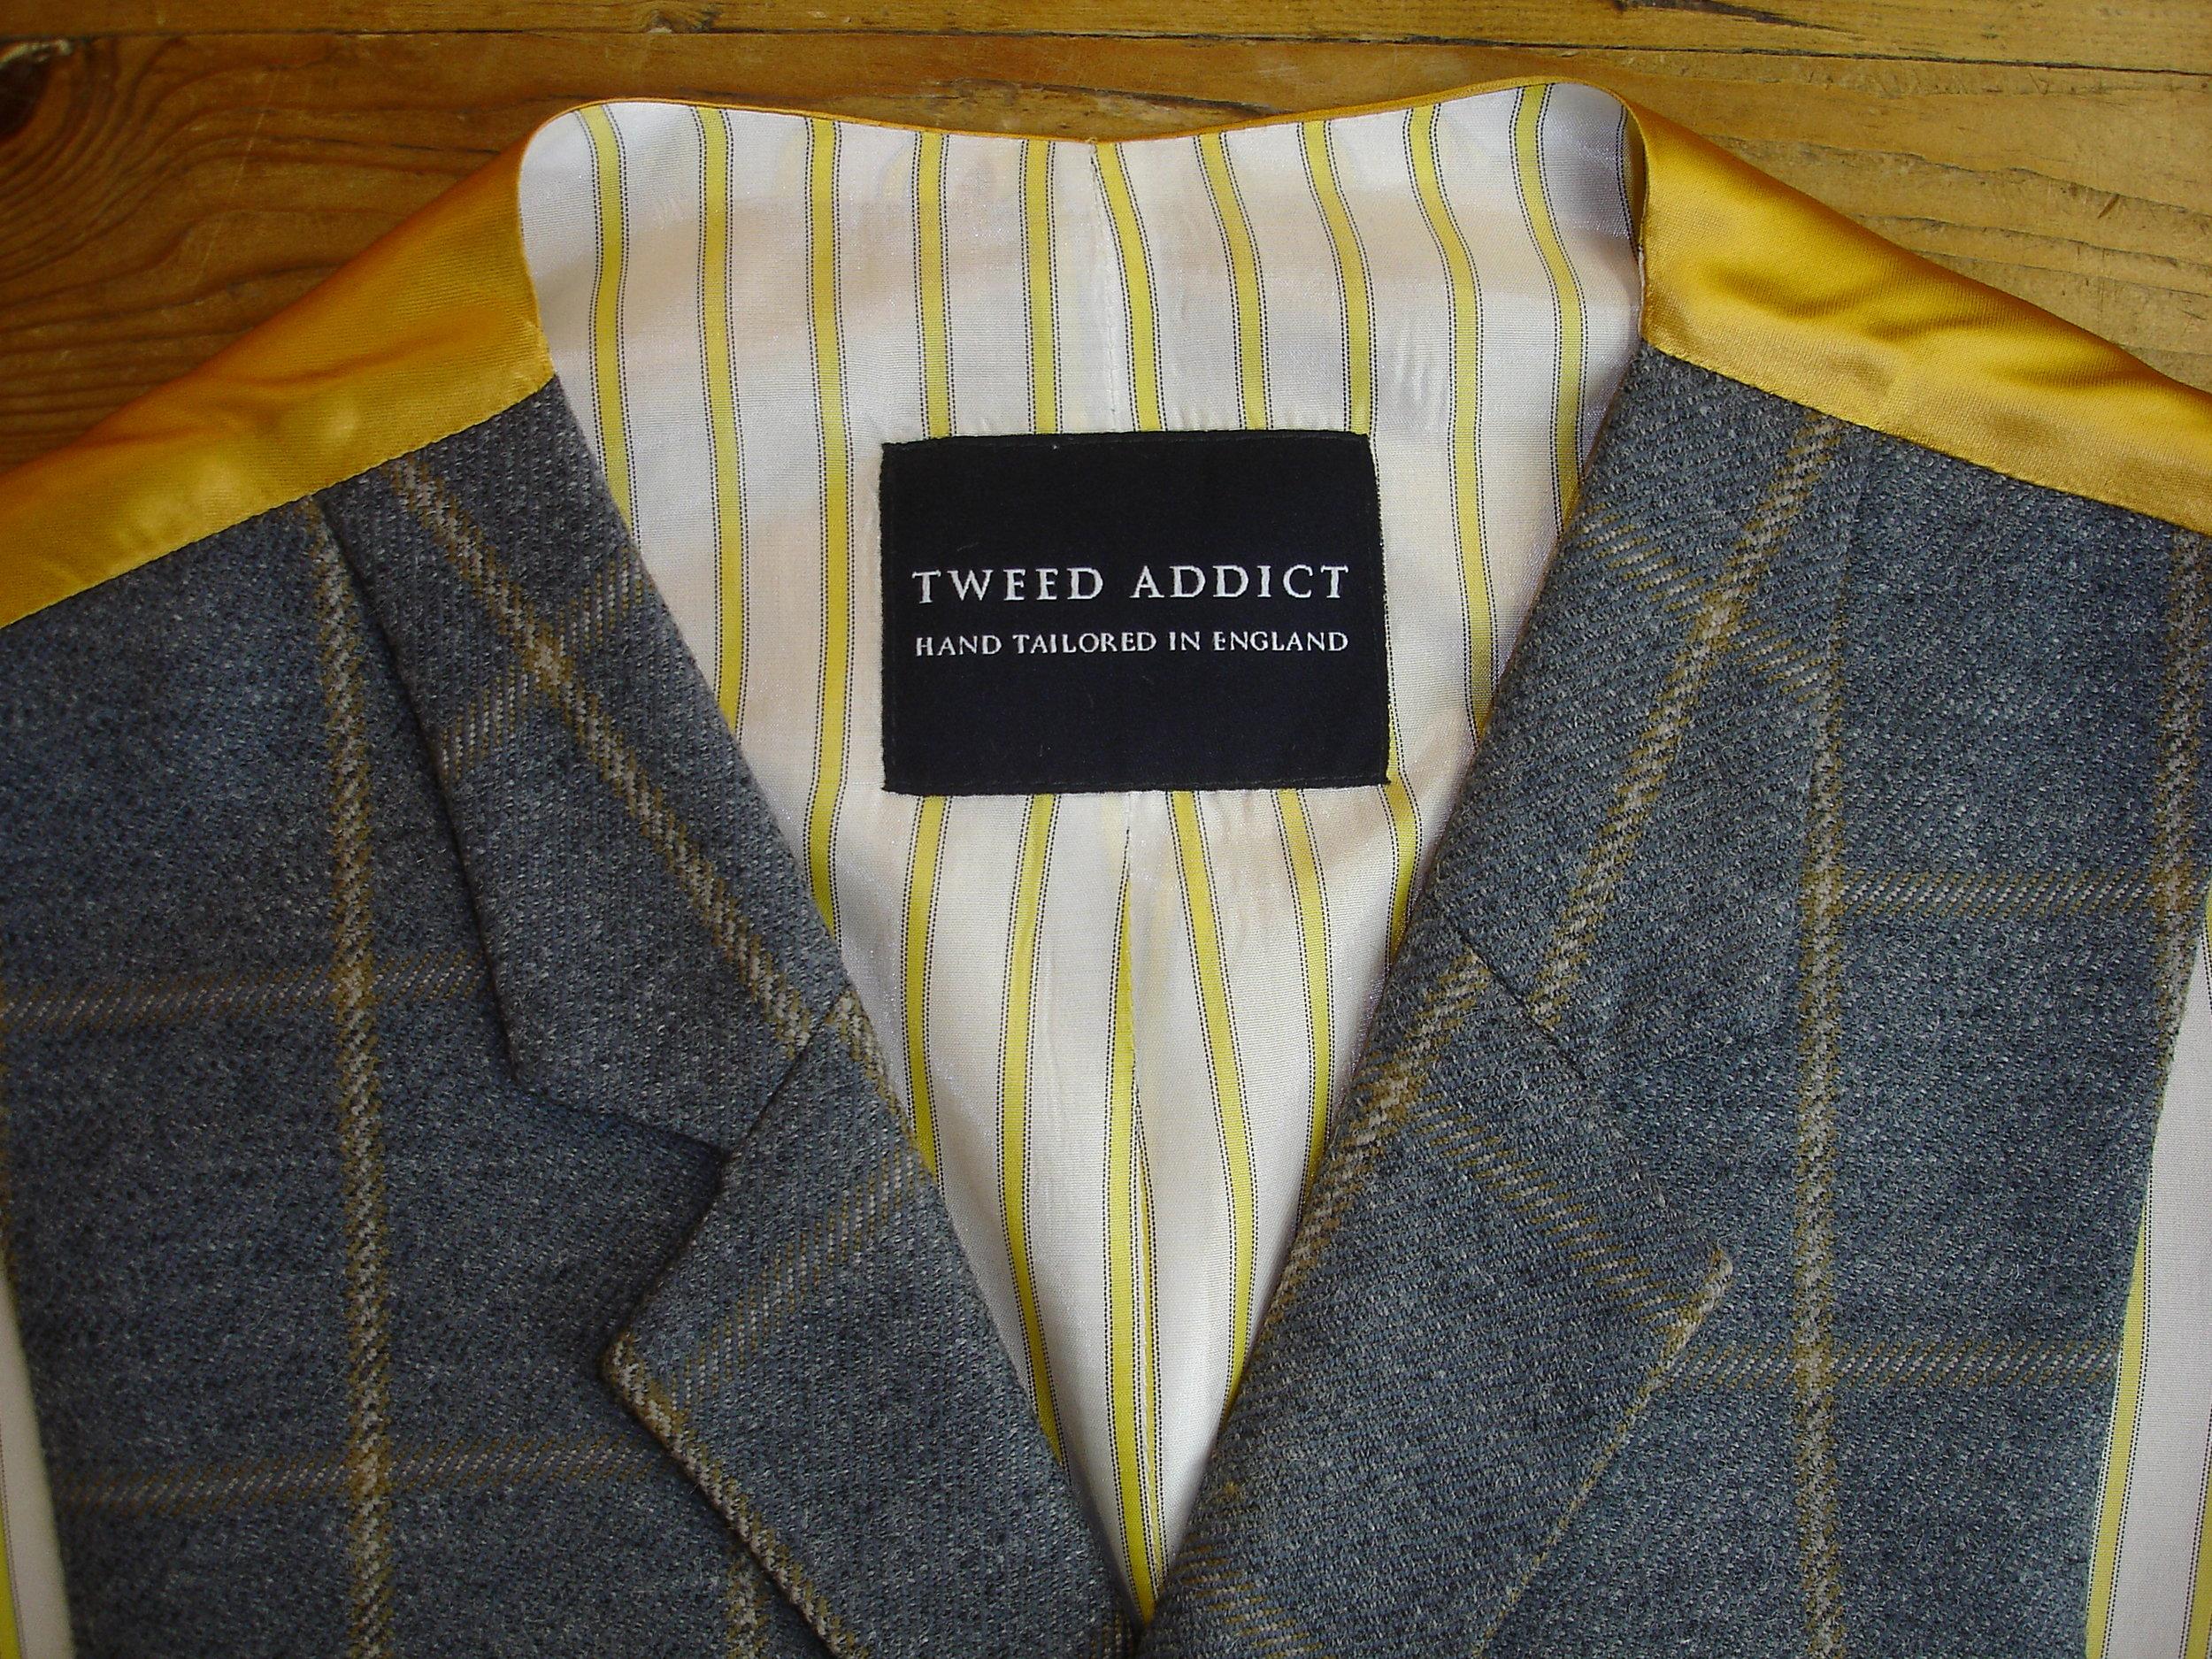 Glenhunt Grey Check 3 Piece Tweed Suit (1).JPG